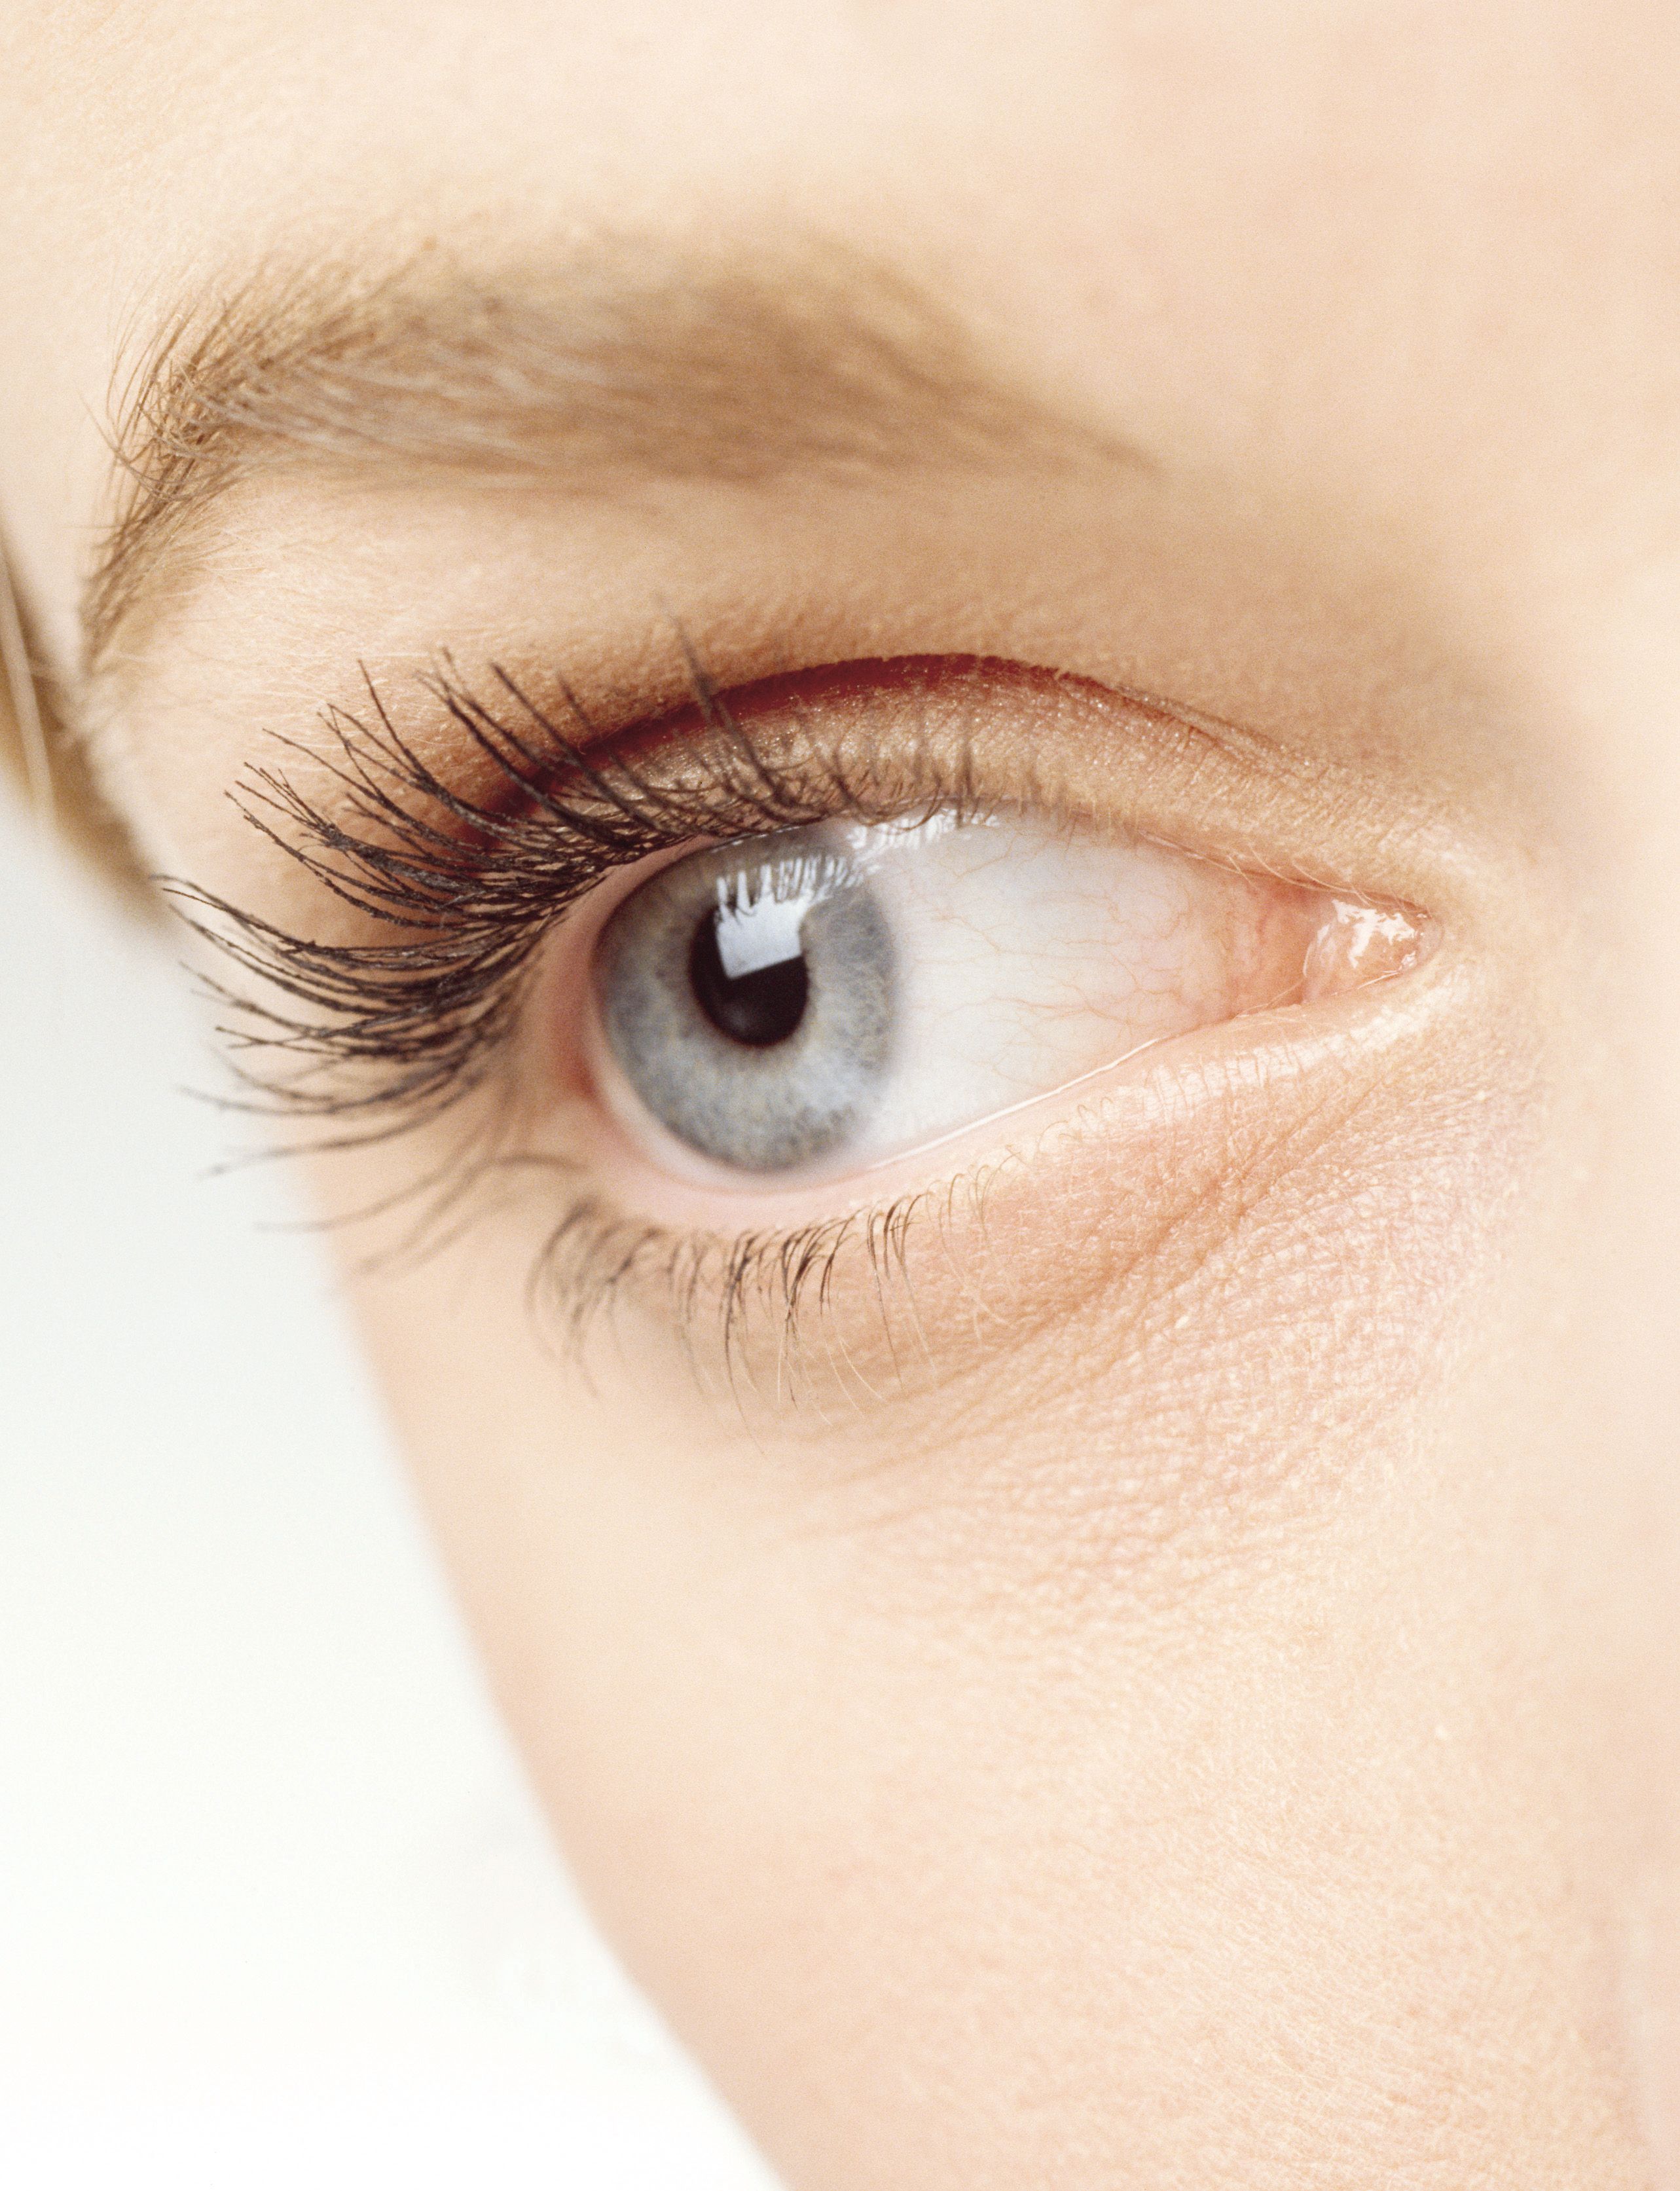 Grow Cut longer eyelashes